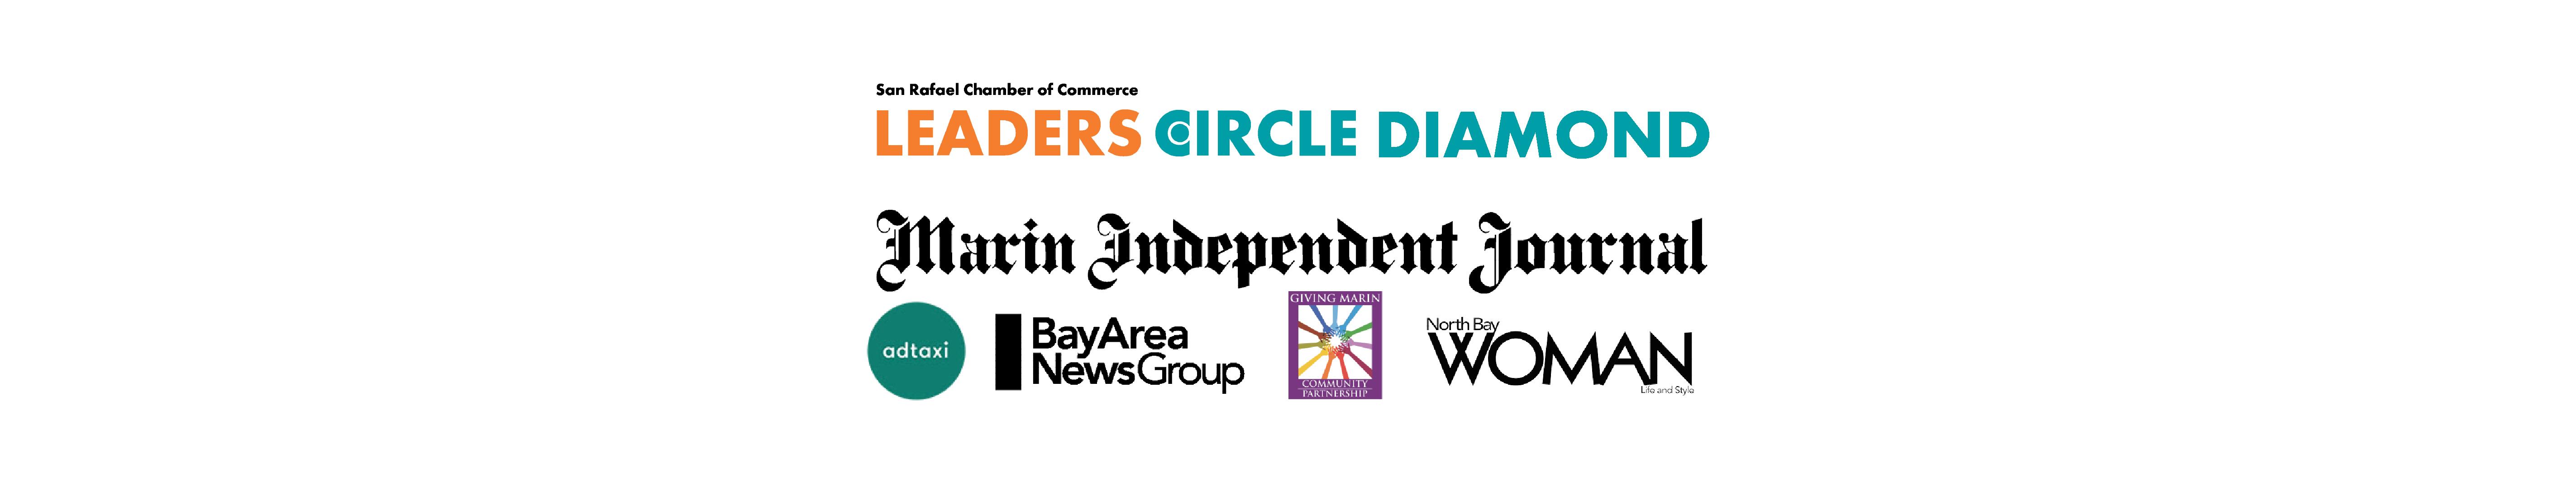 Leaders-Circle-Diamond-05.png